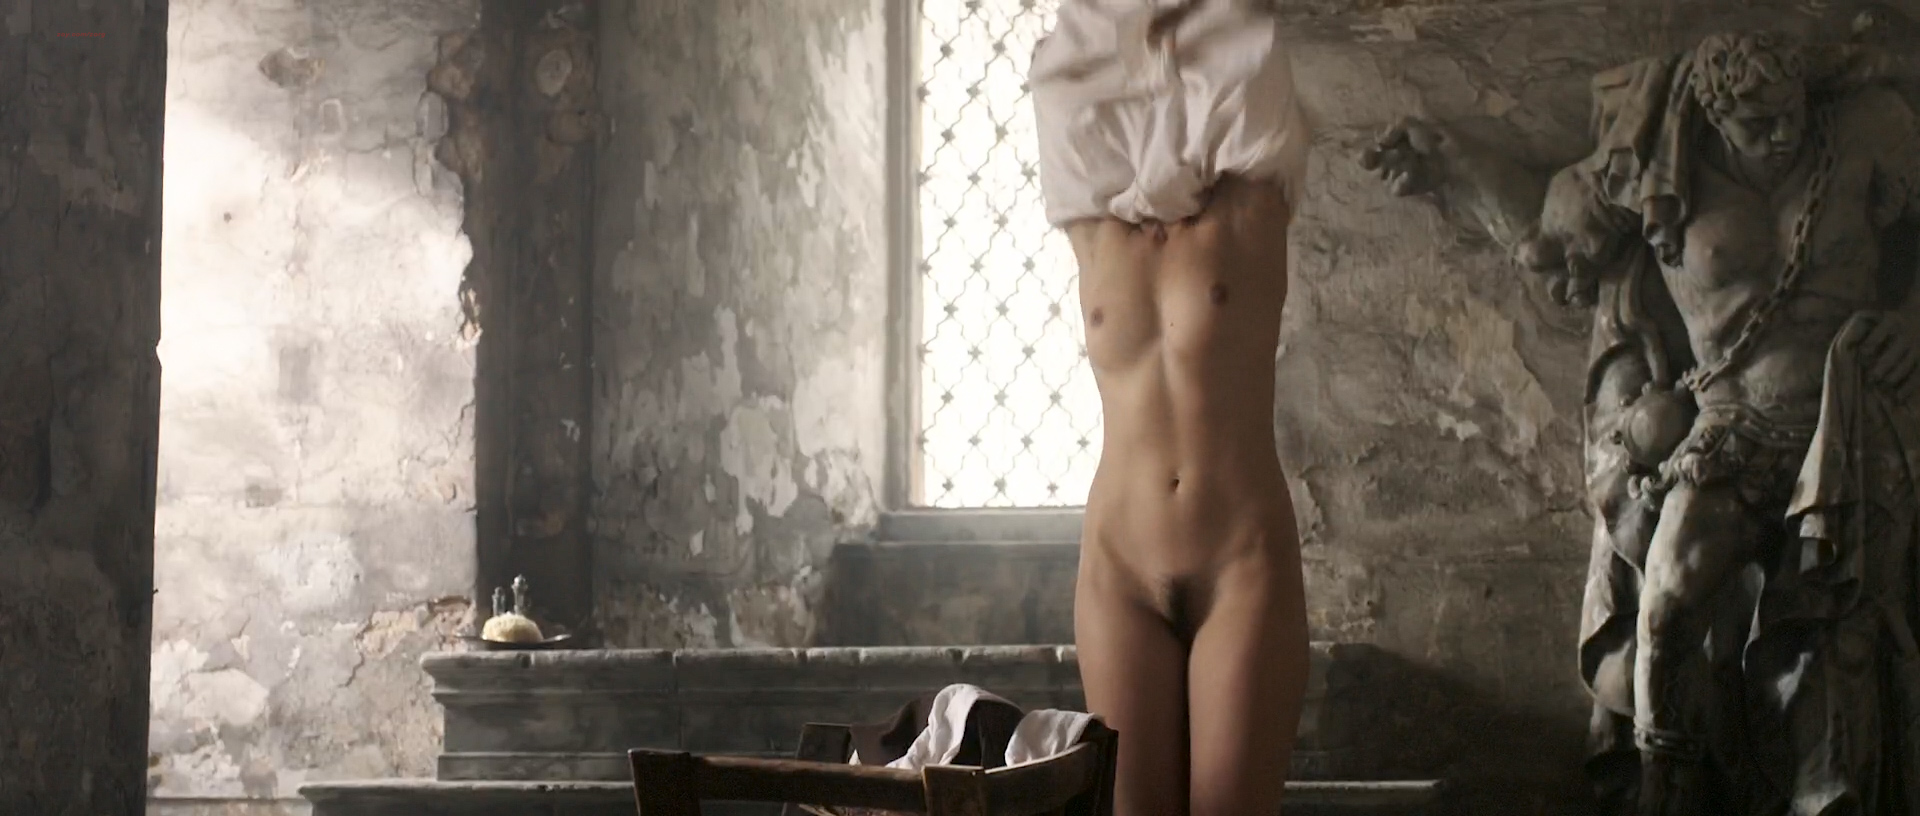 Natalie Madueno Nude